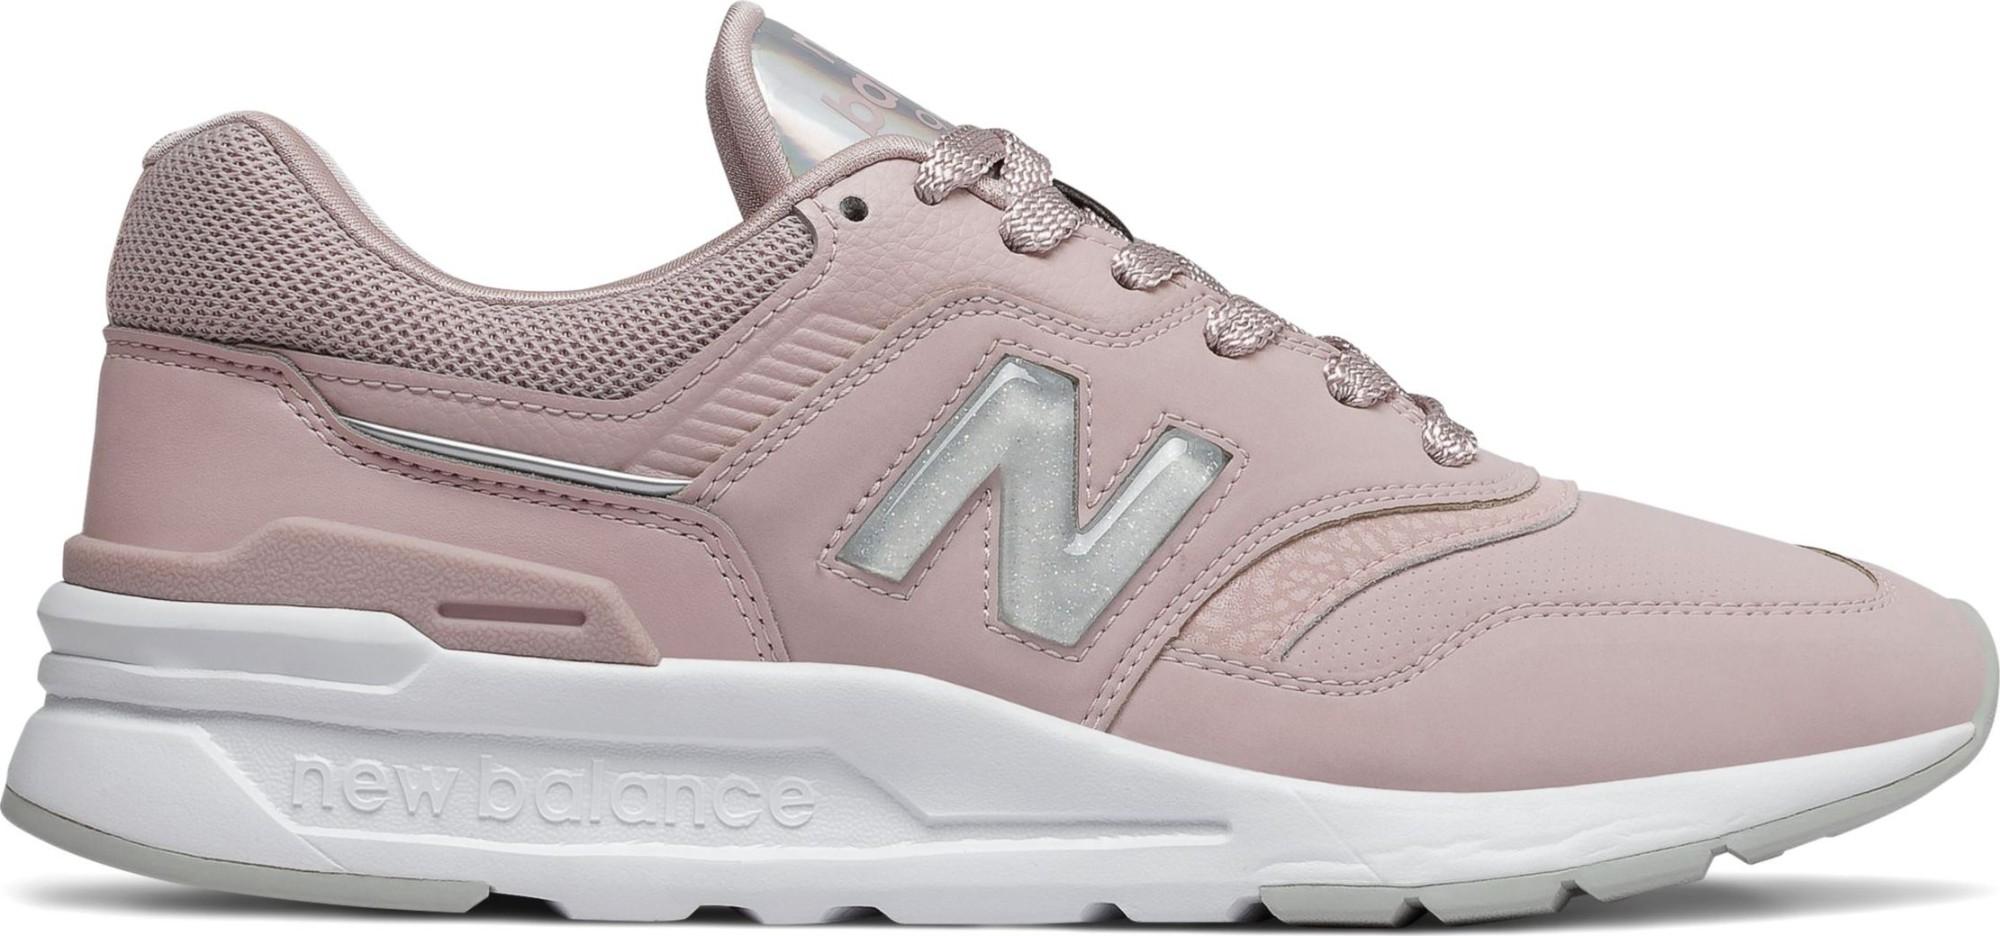 New Balance CW997 Pink HBL 40